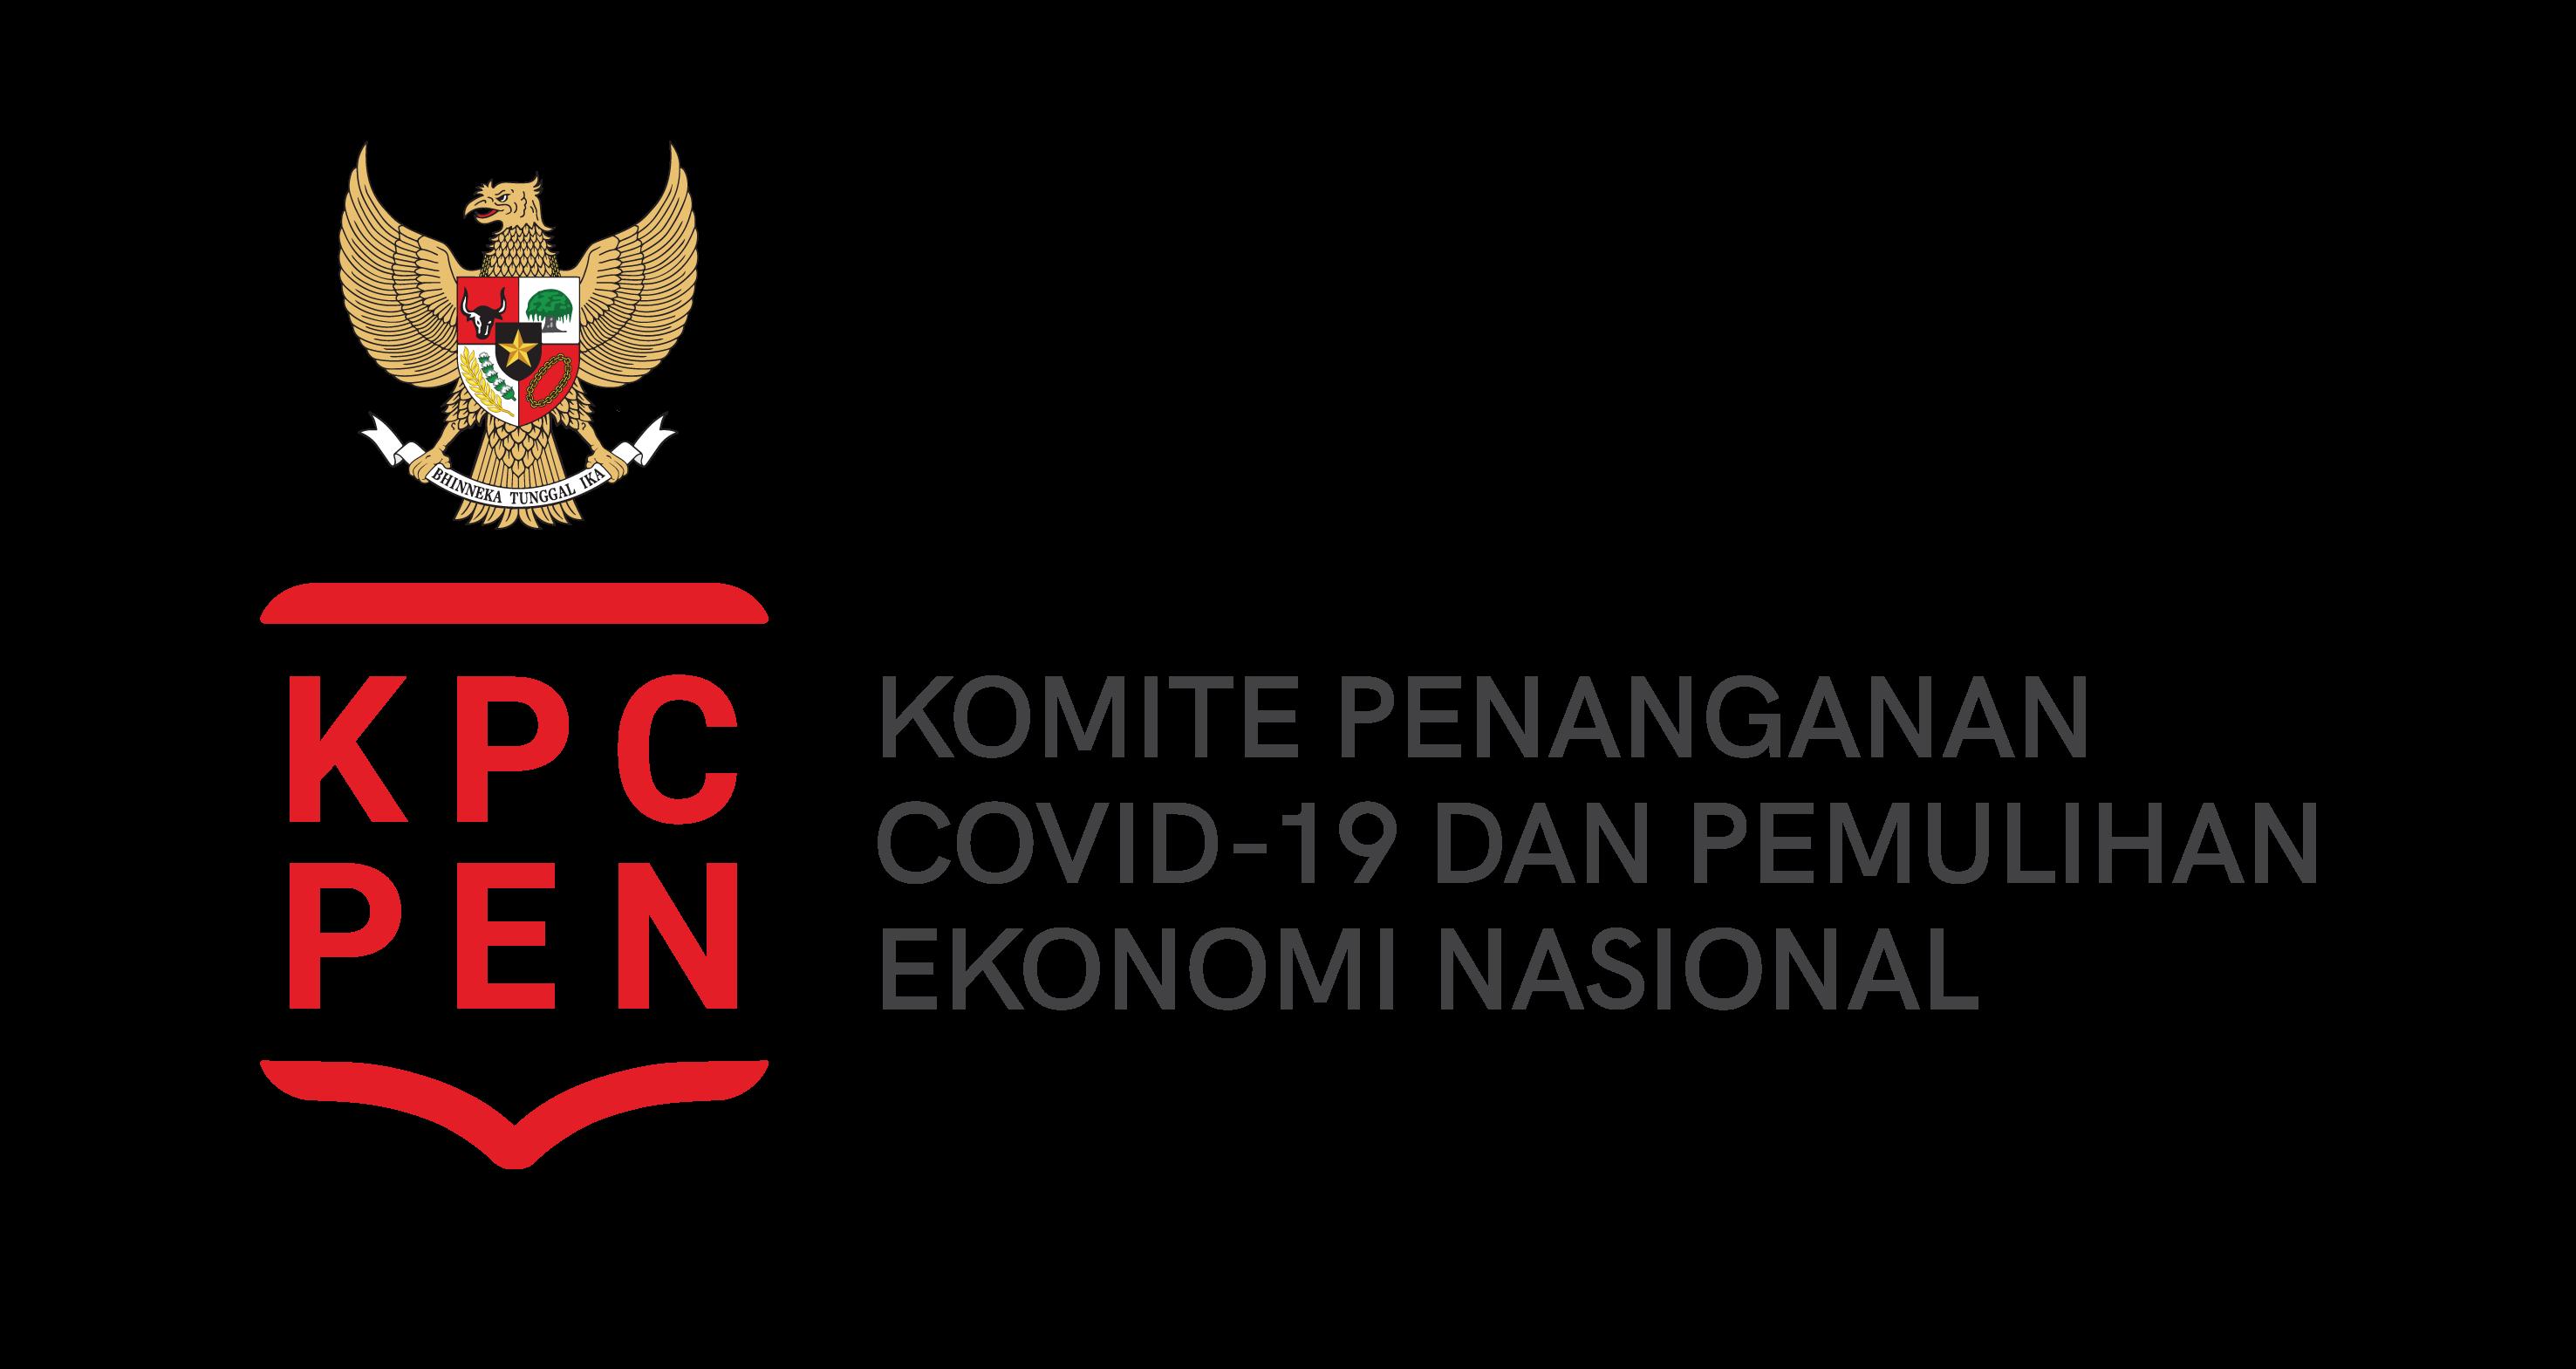 logo kpcpen